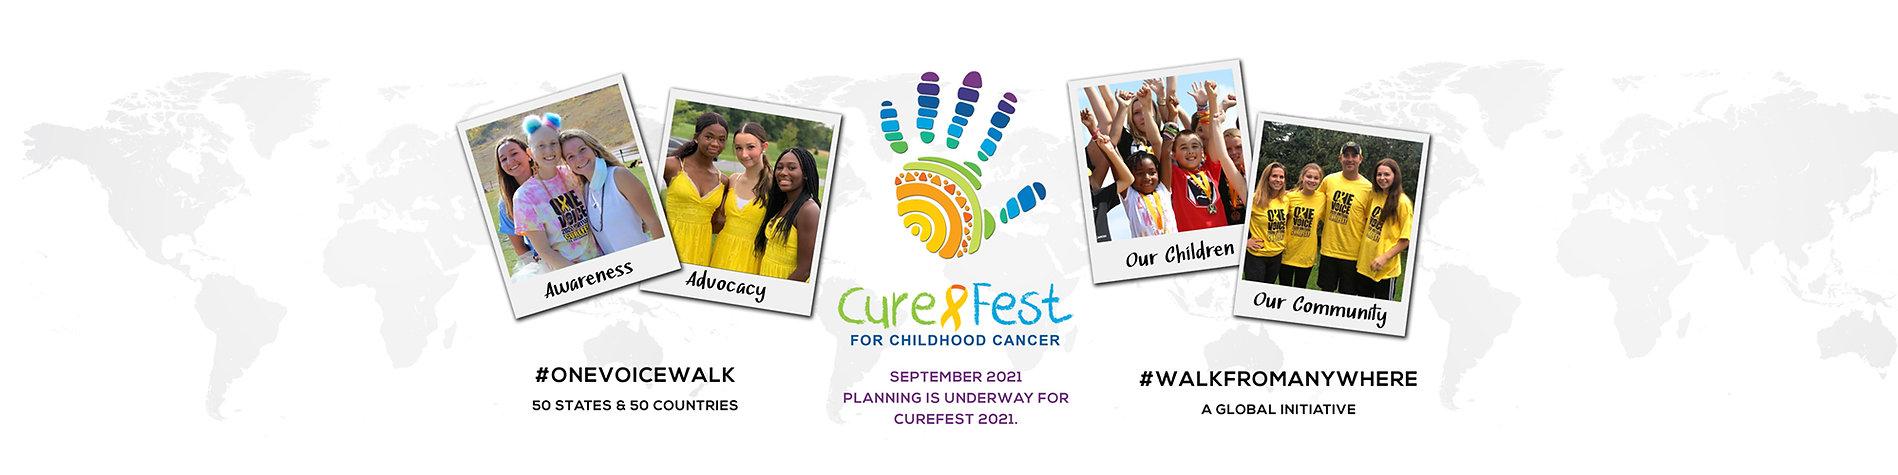 curefest banner21 march wide2.jpg